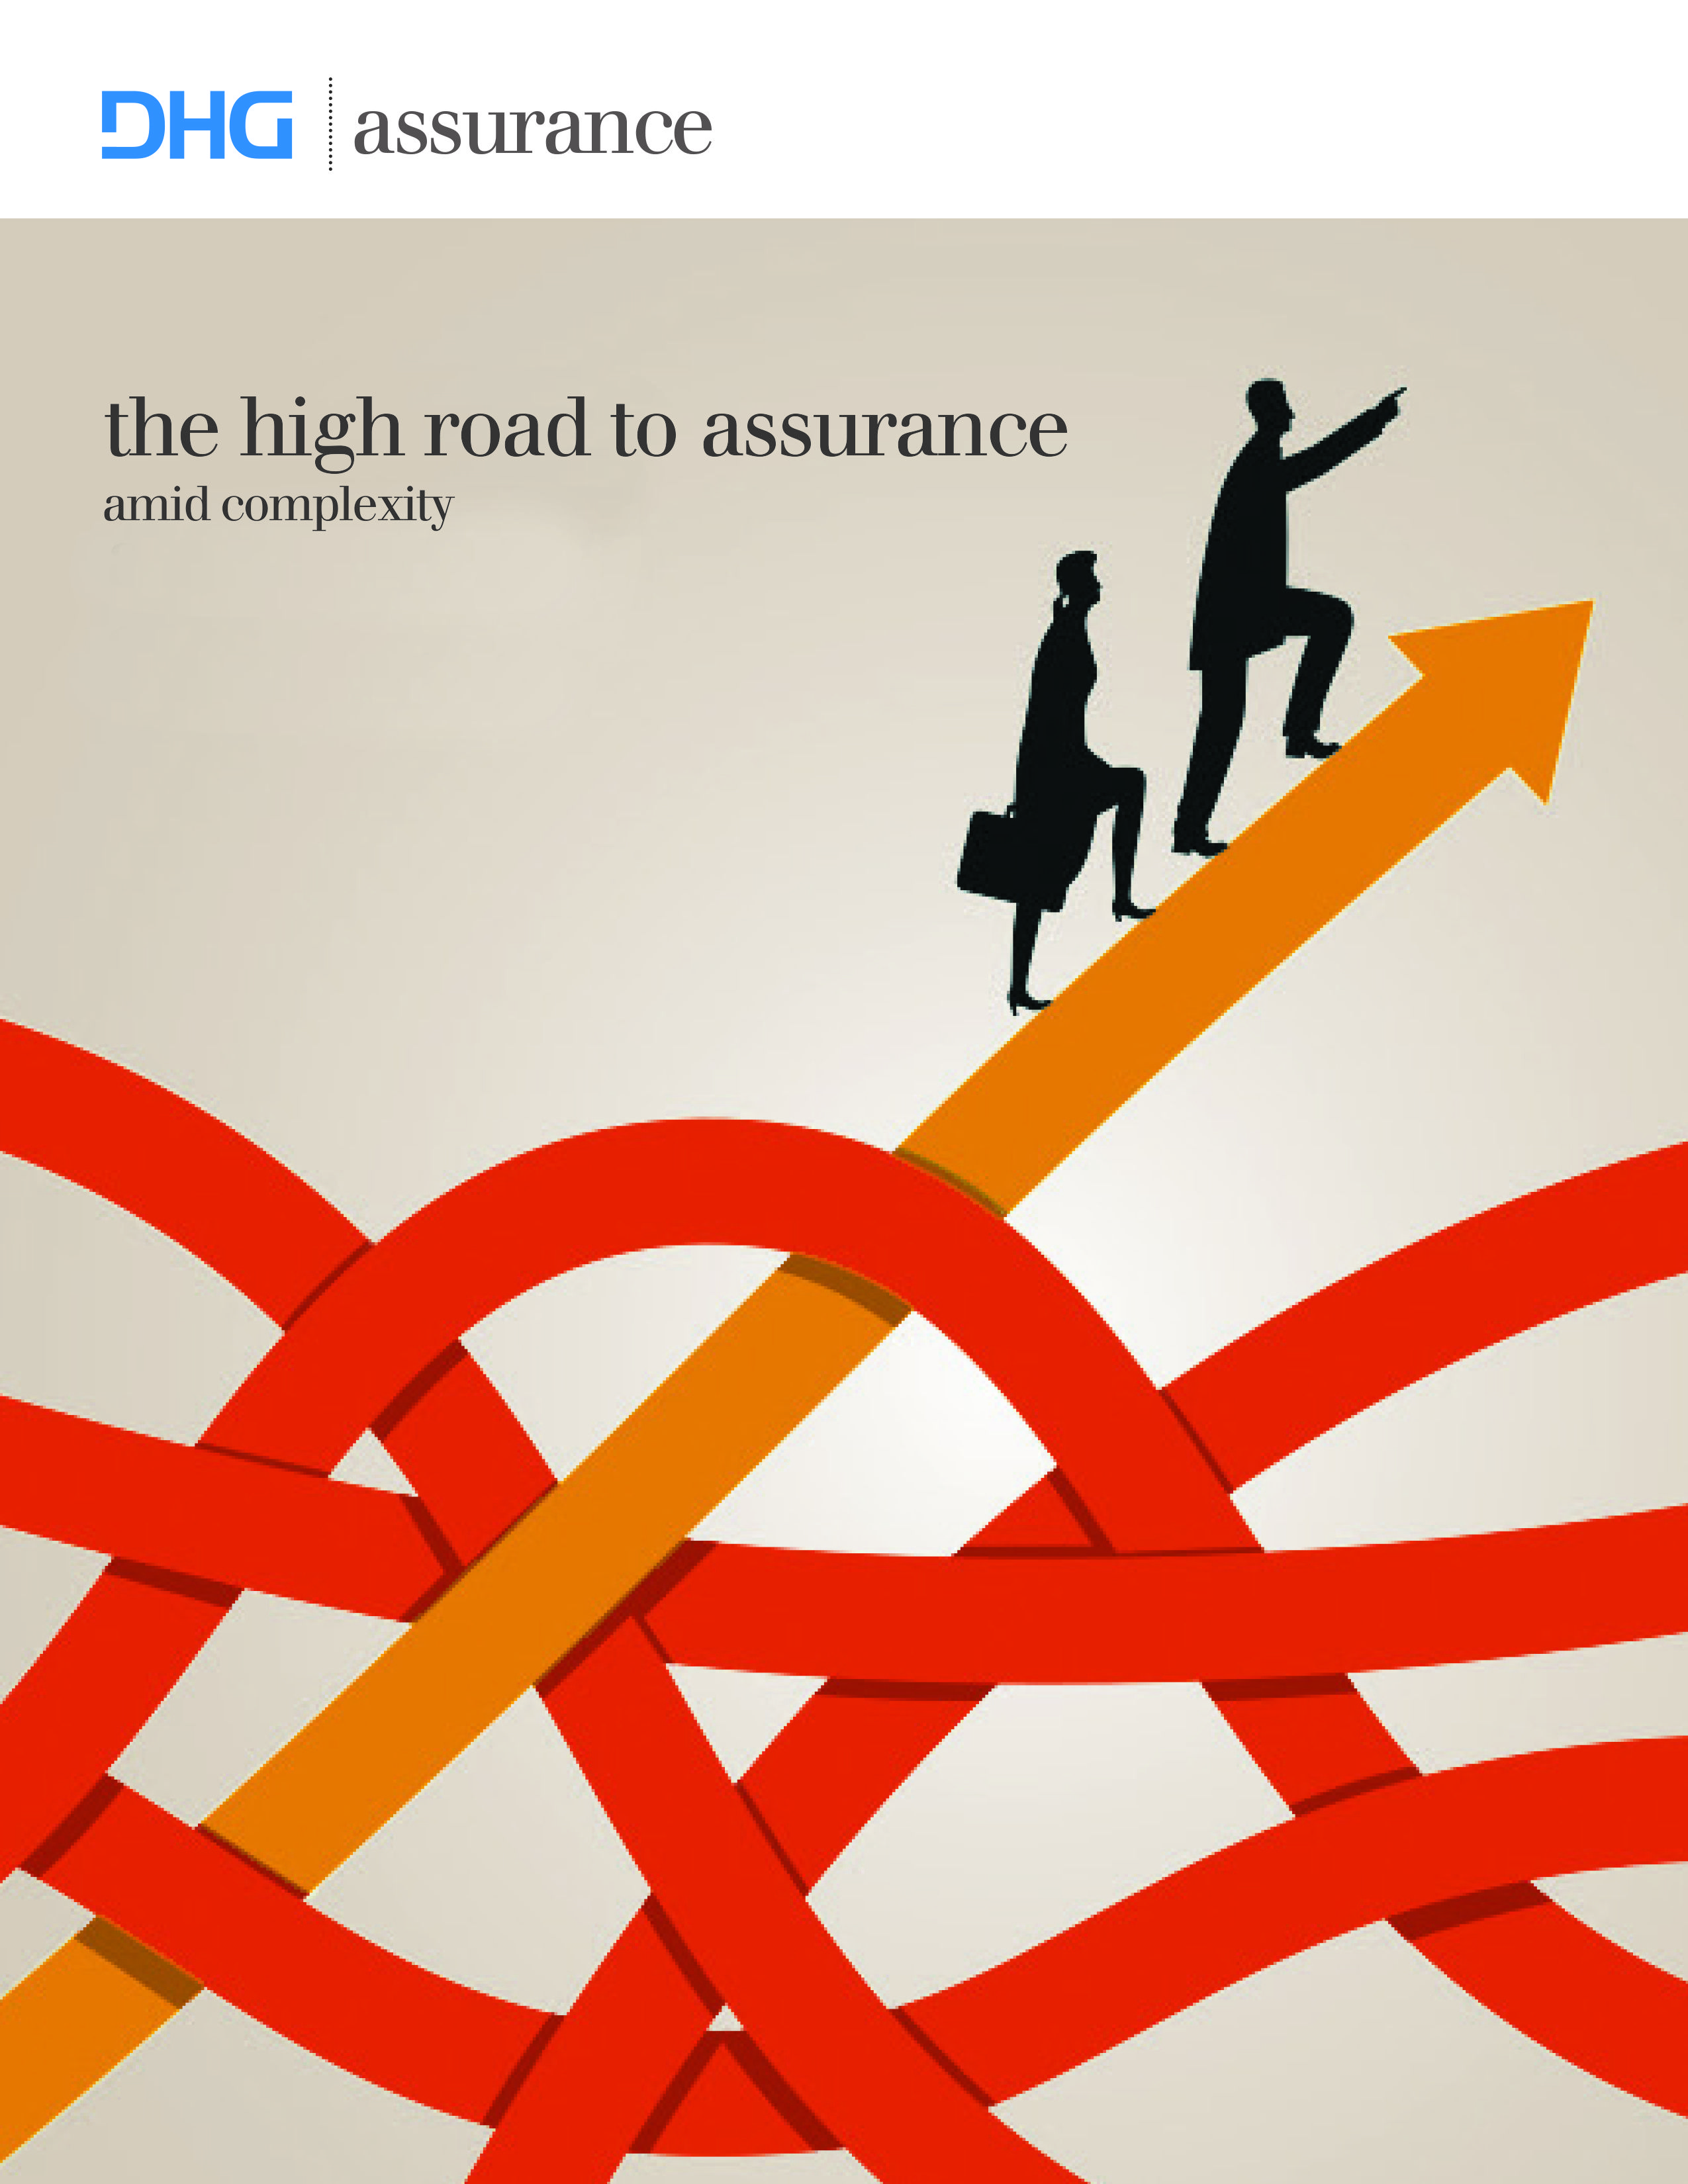 Dixon hughes goodman assurance brochure cover brand book